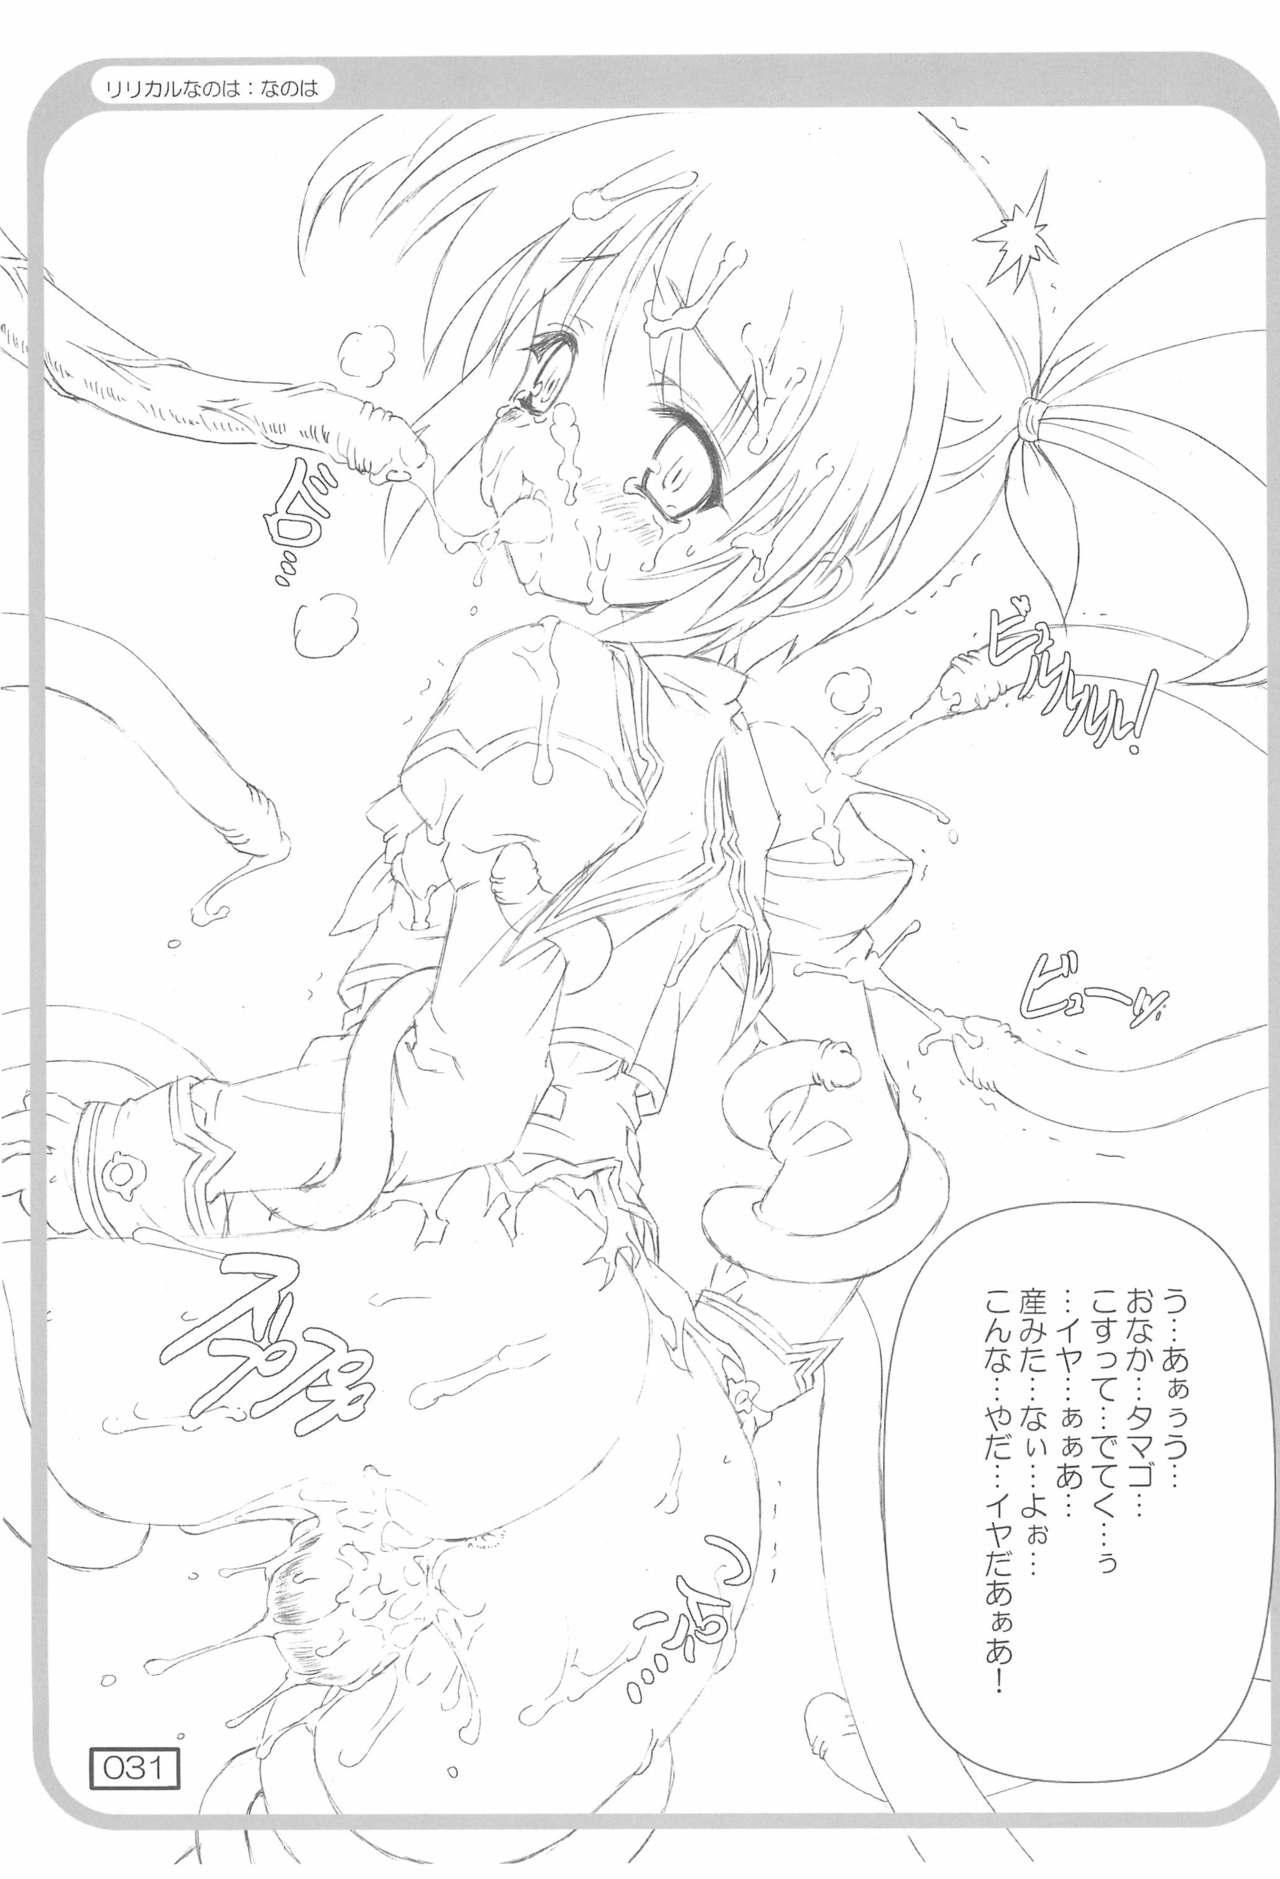 (C72) [Testa Kitchen (Testa)] Jinsei (=ω=.)/ Konata (Lucky Star) 30